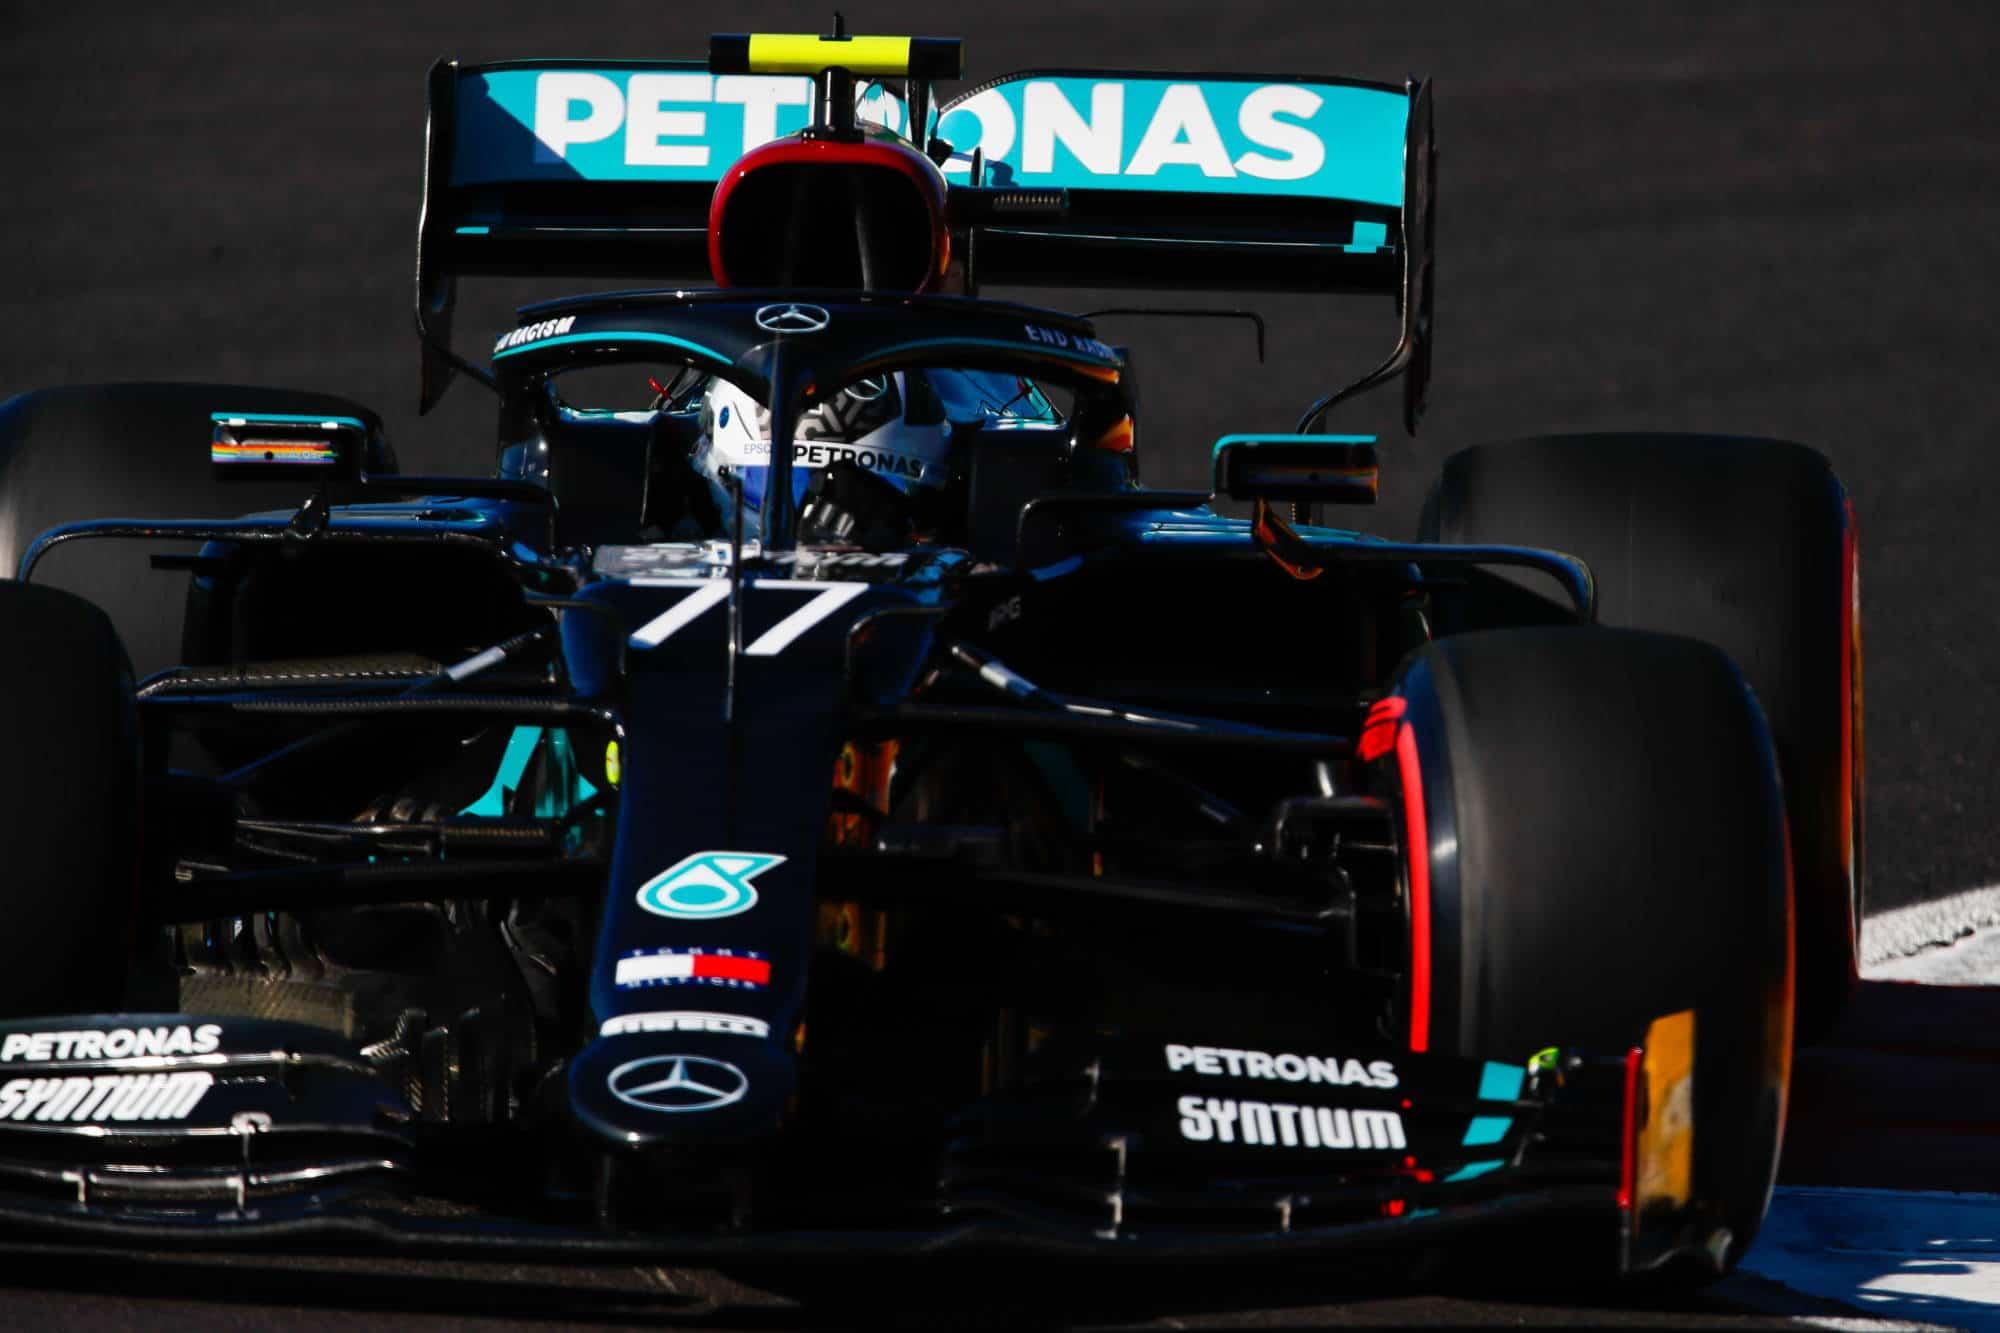 2020 Portugal GP Bottas Mercedes F1 W11 soft qualifying Photo Daimler